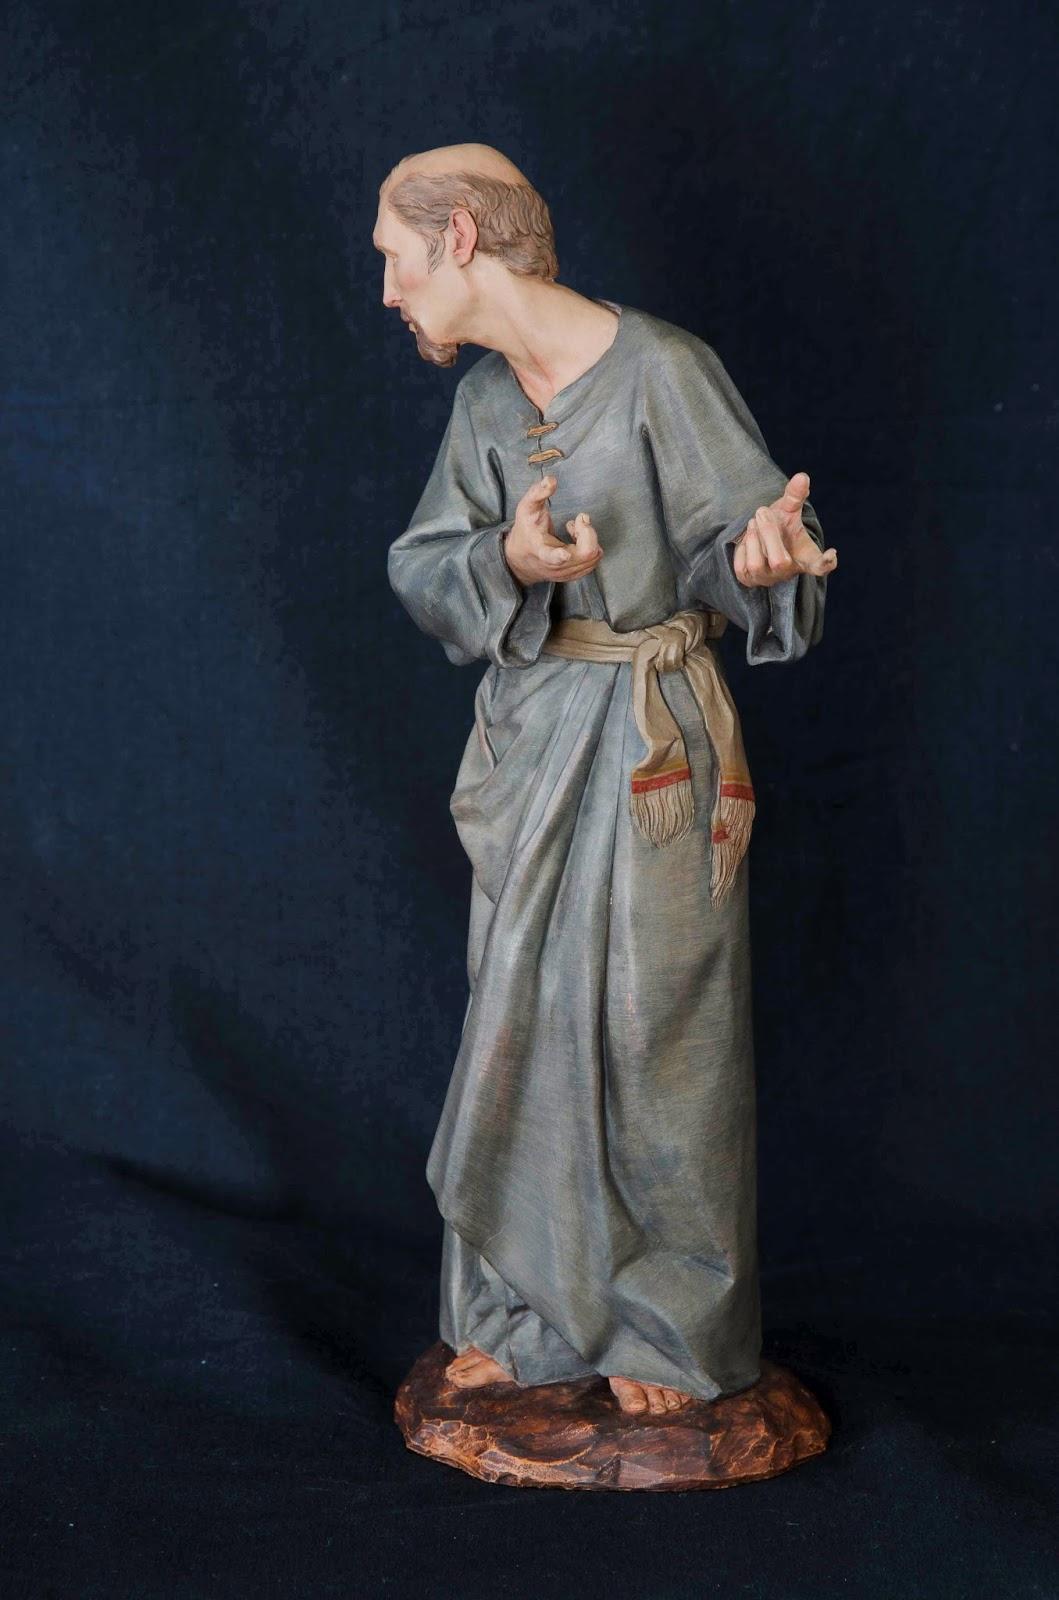 Belén presepe nativity krippe Arturo Serra escultura barro cocido 18